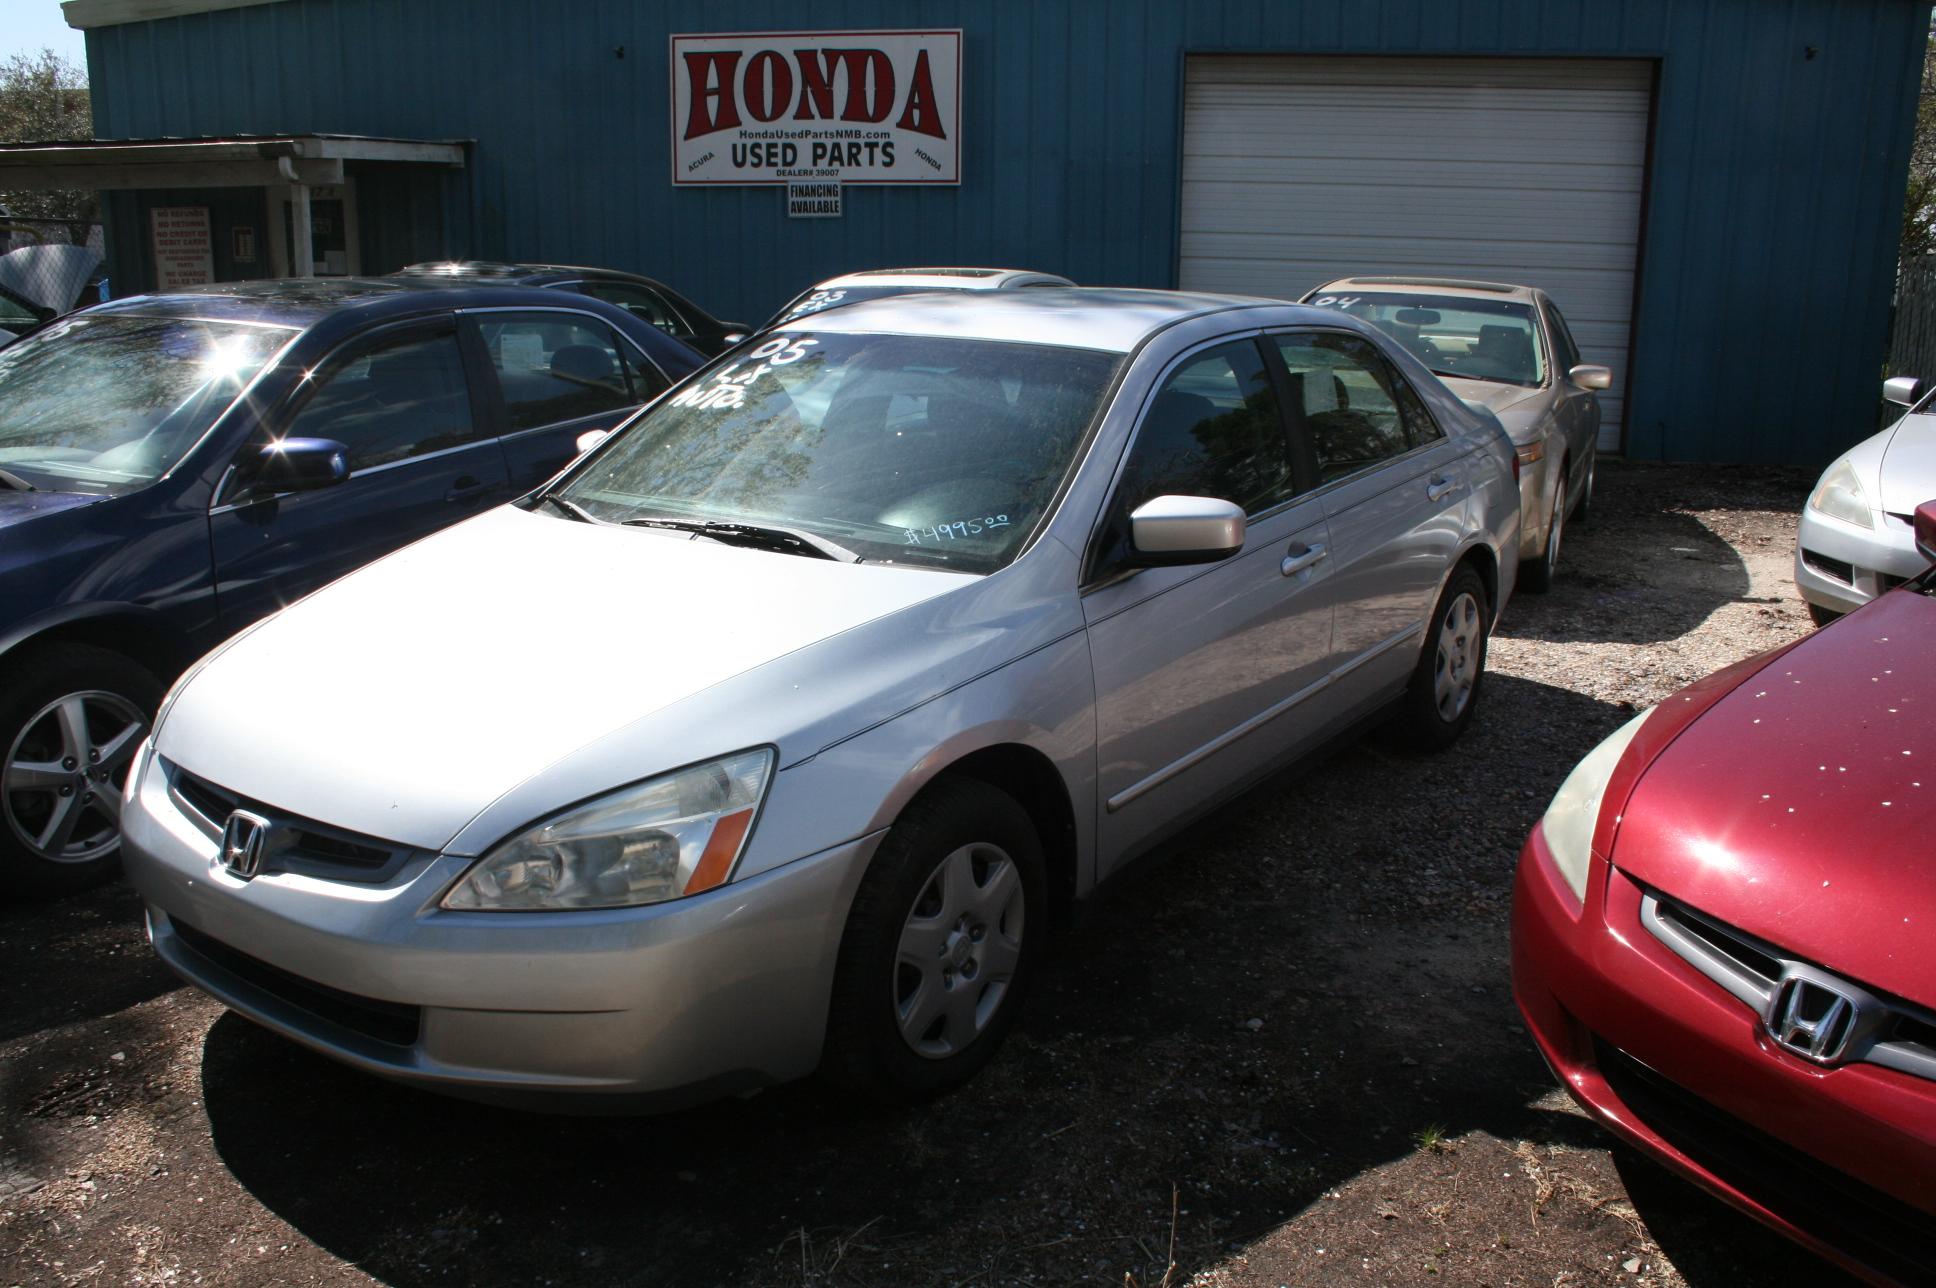 Honda Used Parts - North Myrtle Beach | Honda Used Parts